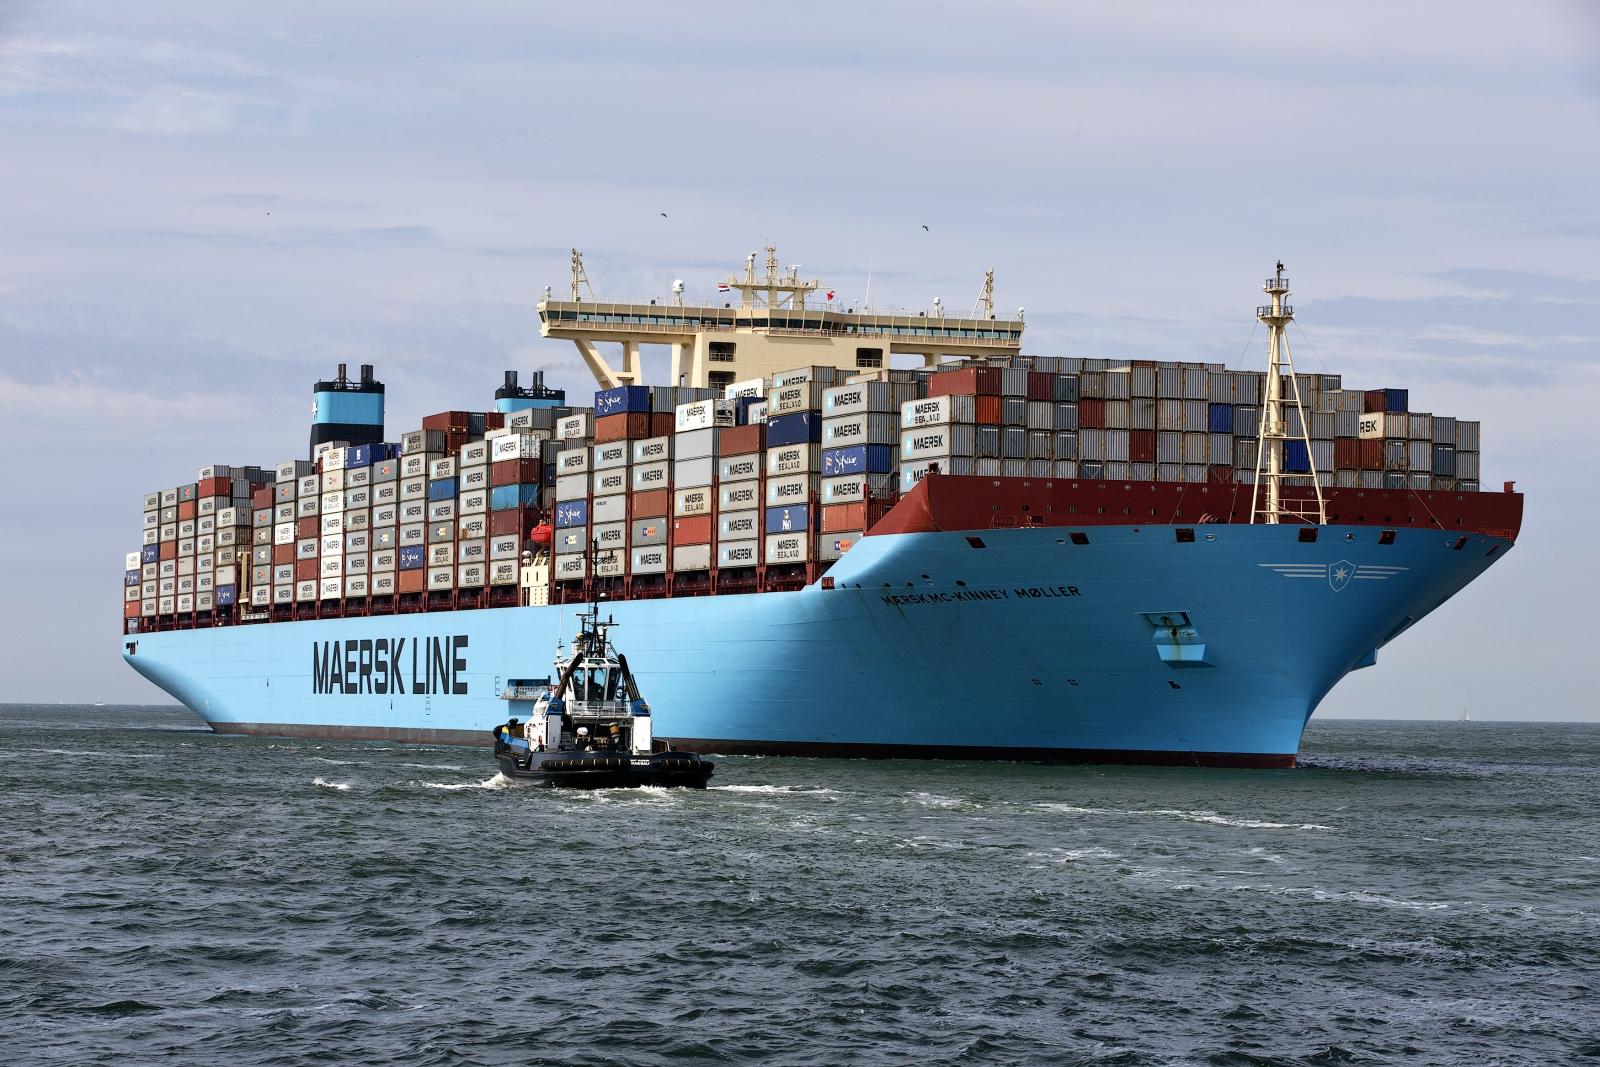 Iran seizes US cargo ship in Gulf: MV Maersk had no ...